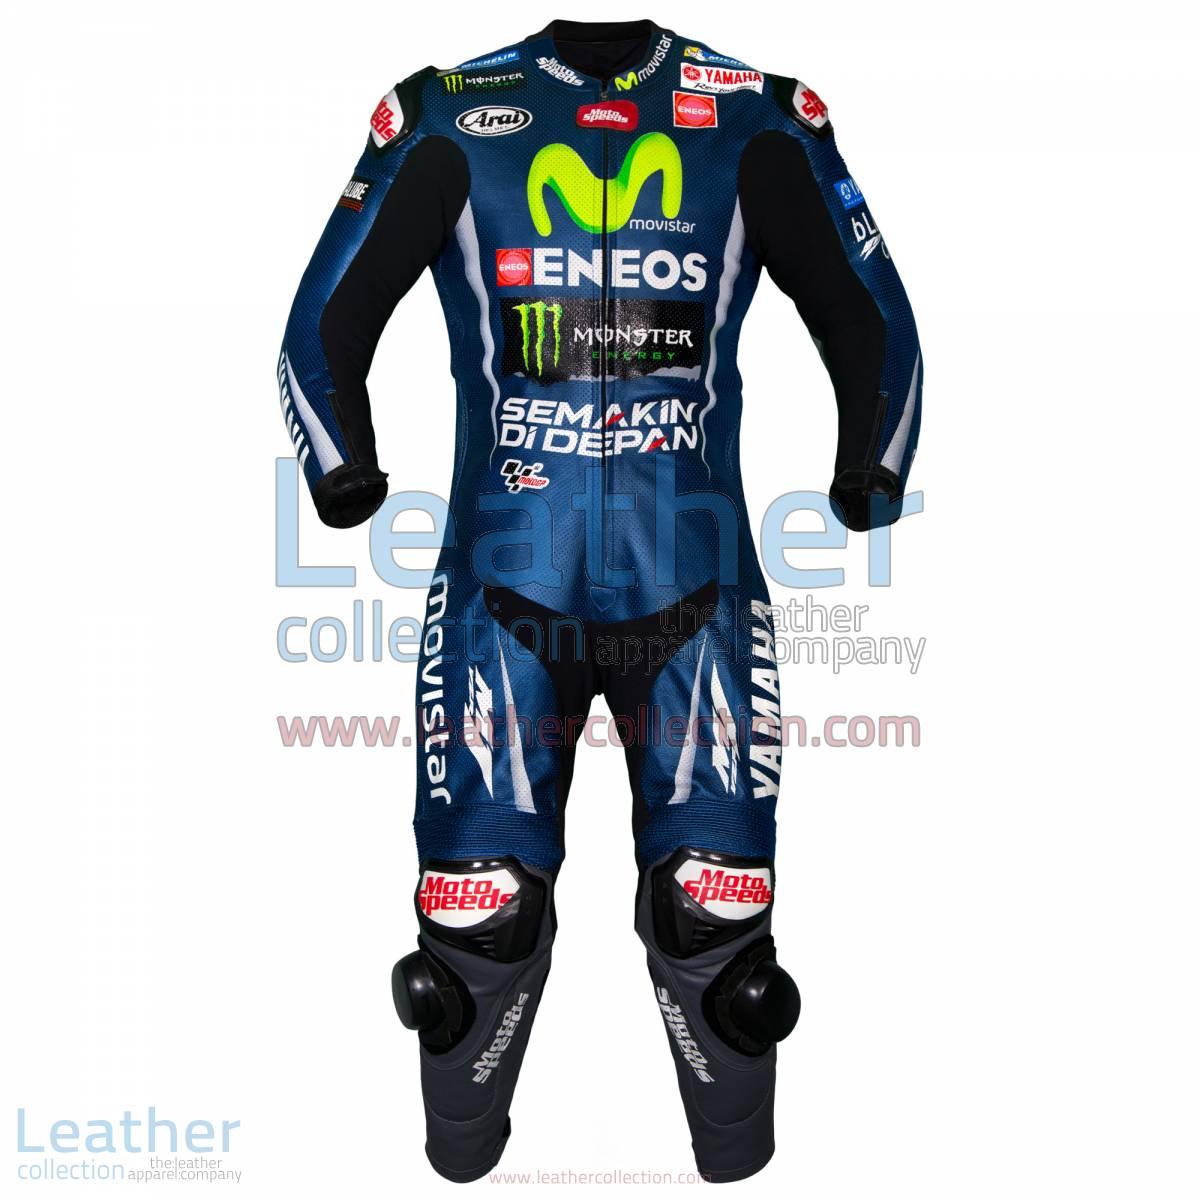 Maverick Vinales Movistar Yamaha MotoGP 2017 Suit